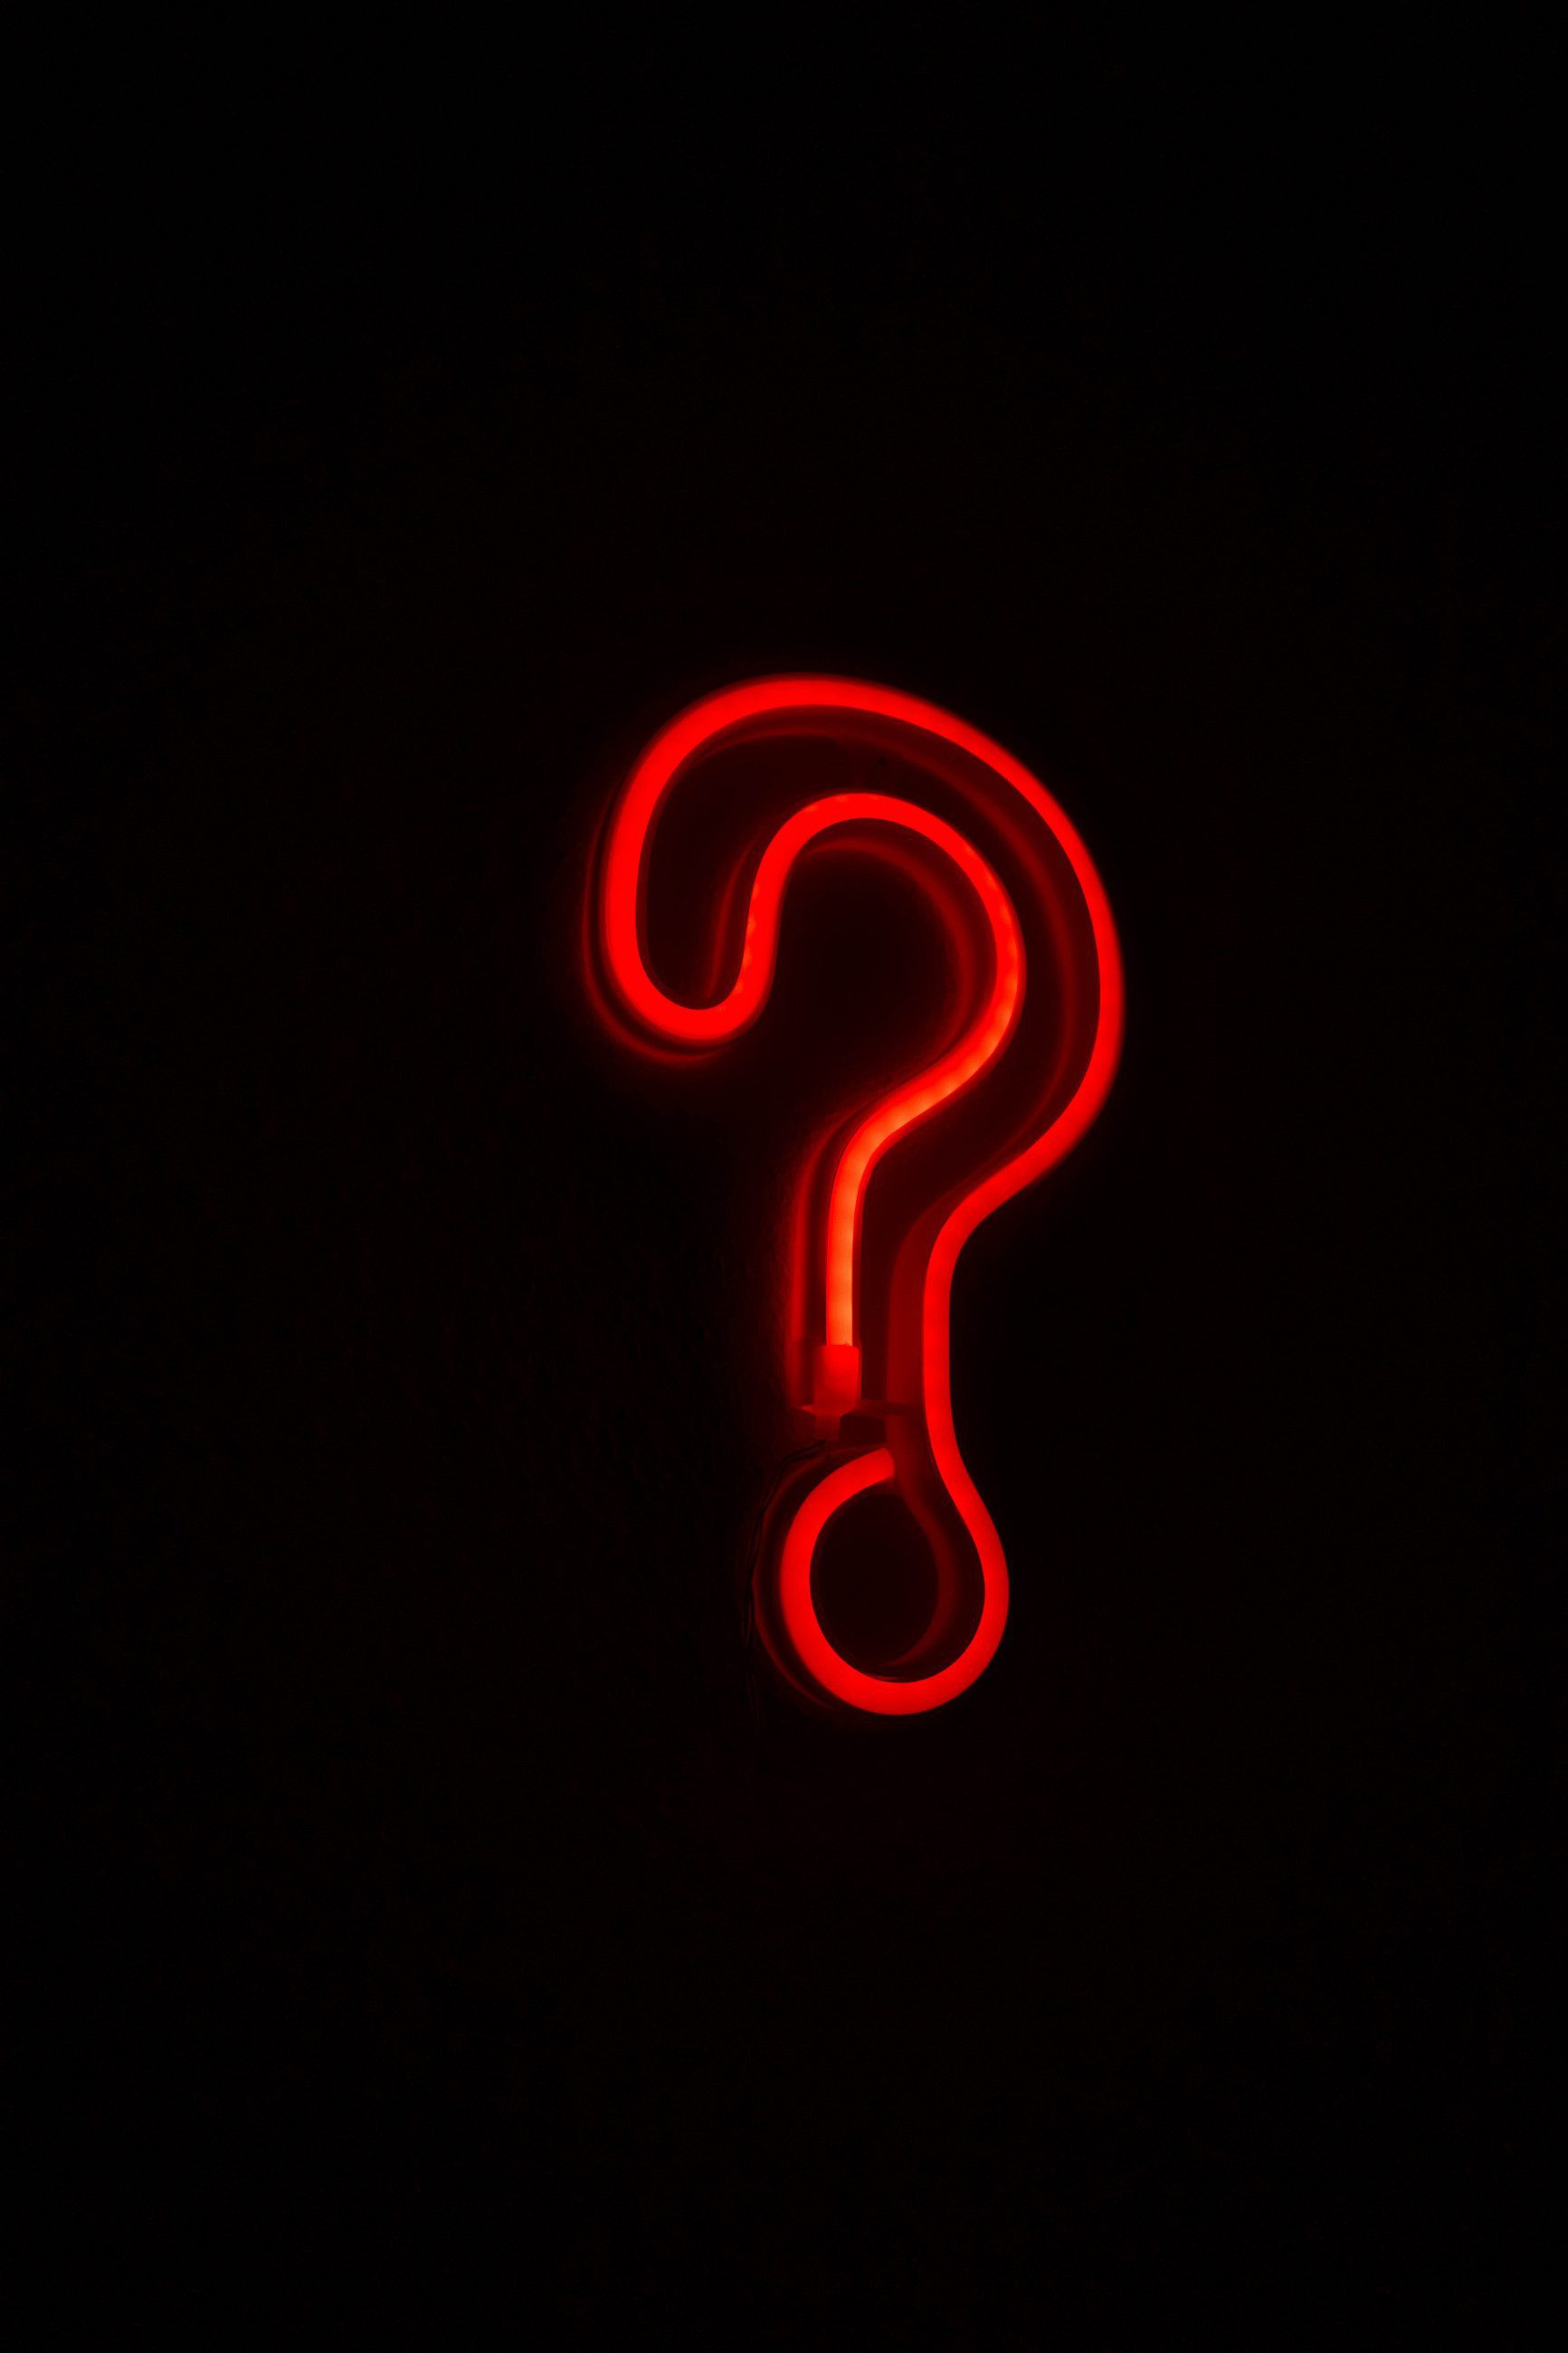 Digital Dilemma question mark